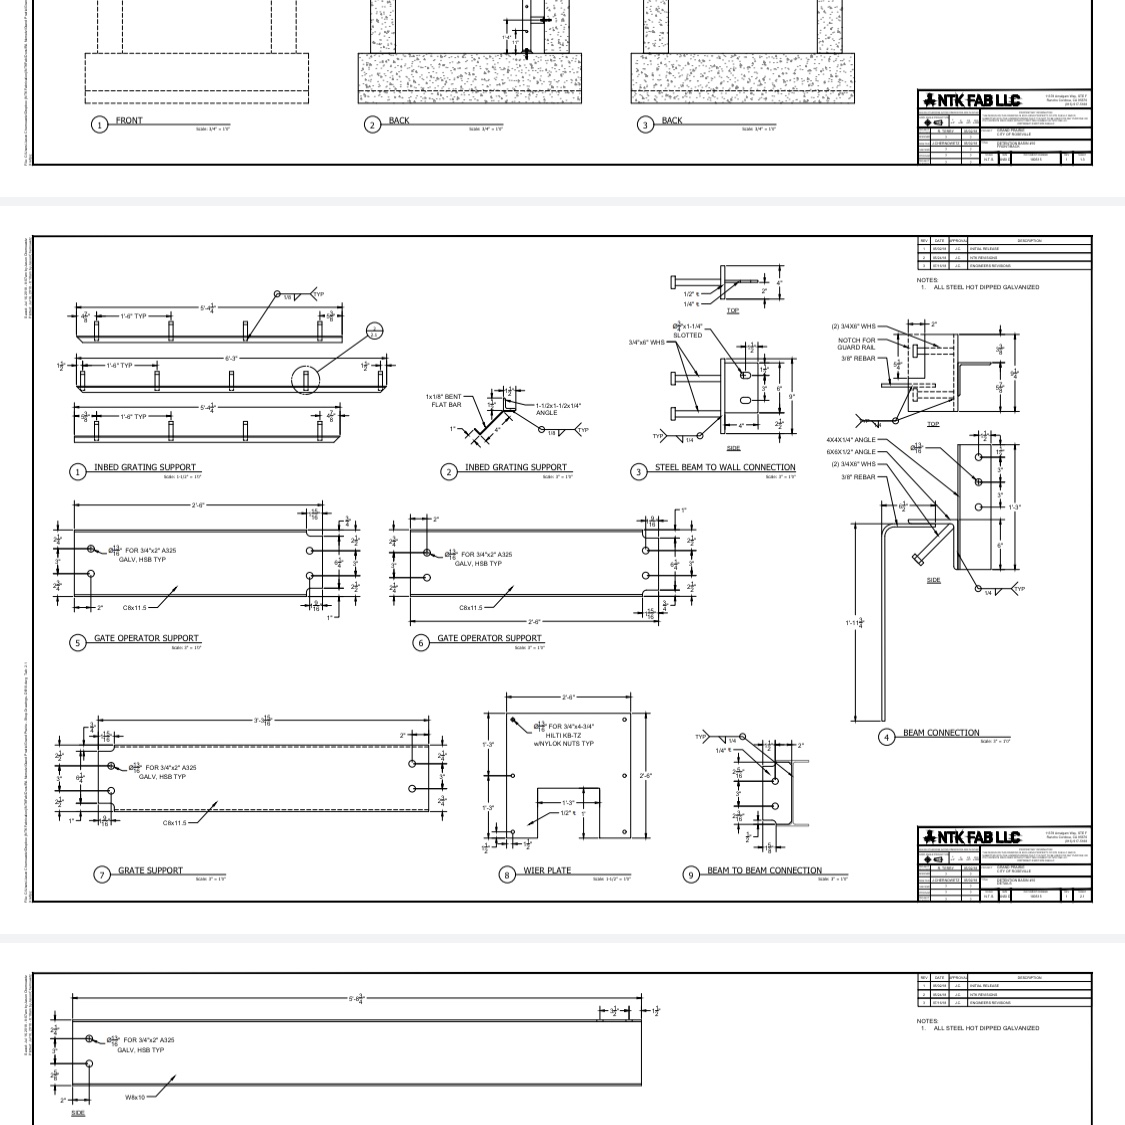 Shop Drawings for Folsom Ranch Hydromodification Basins.